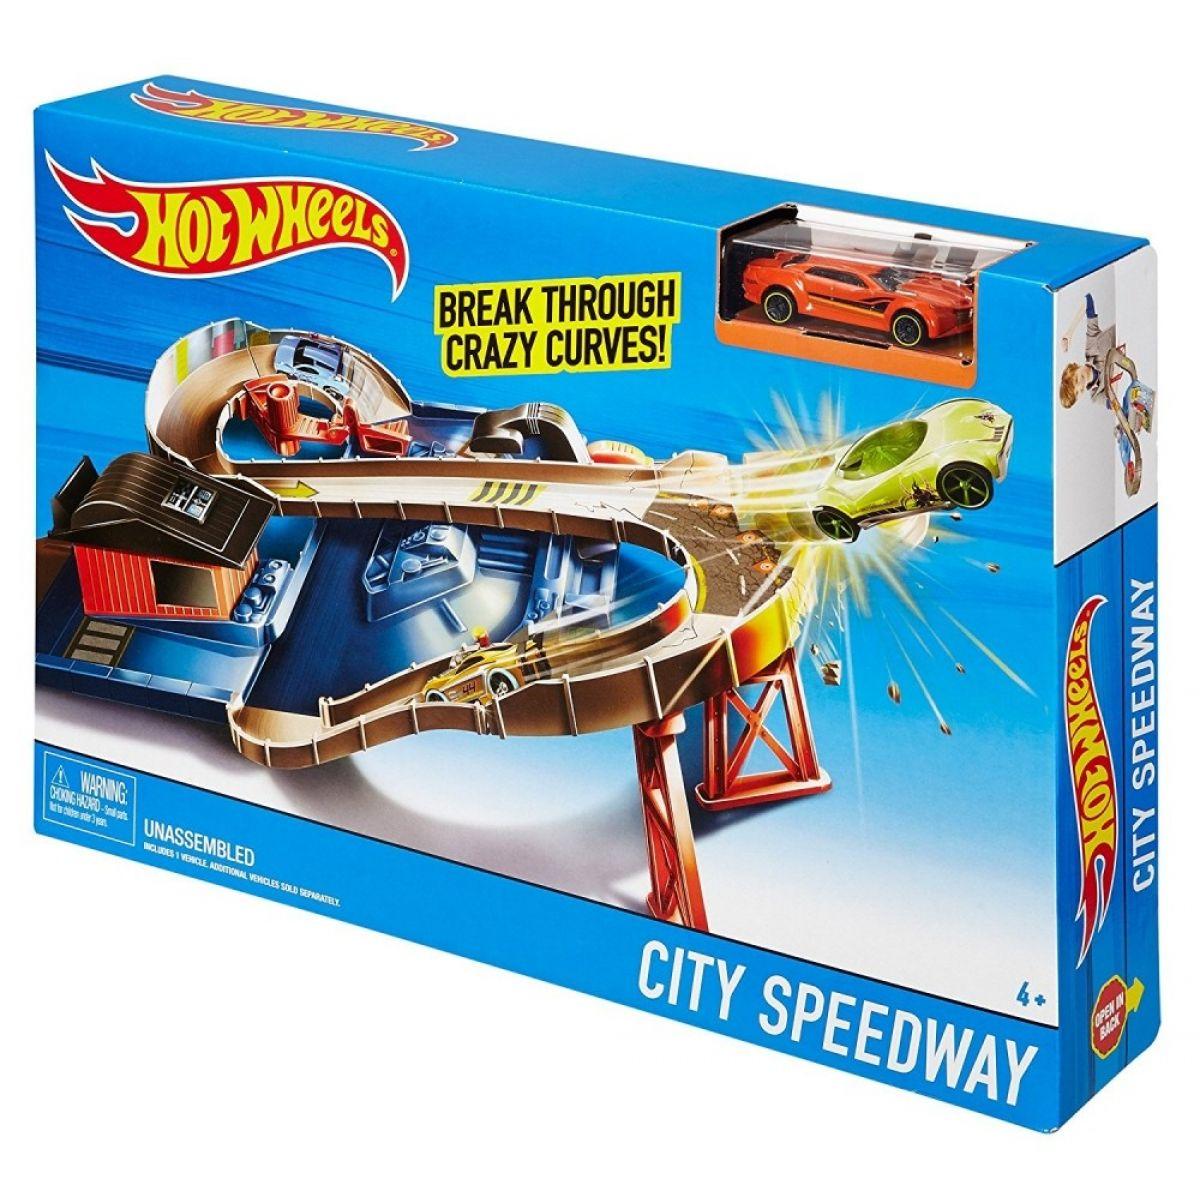 Hot Wheels City Speedway